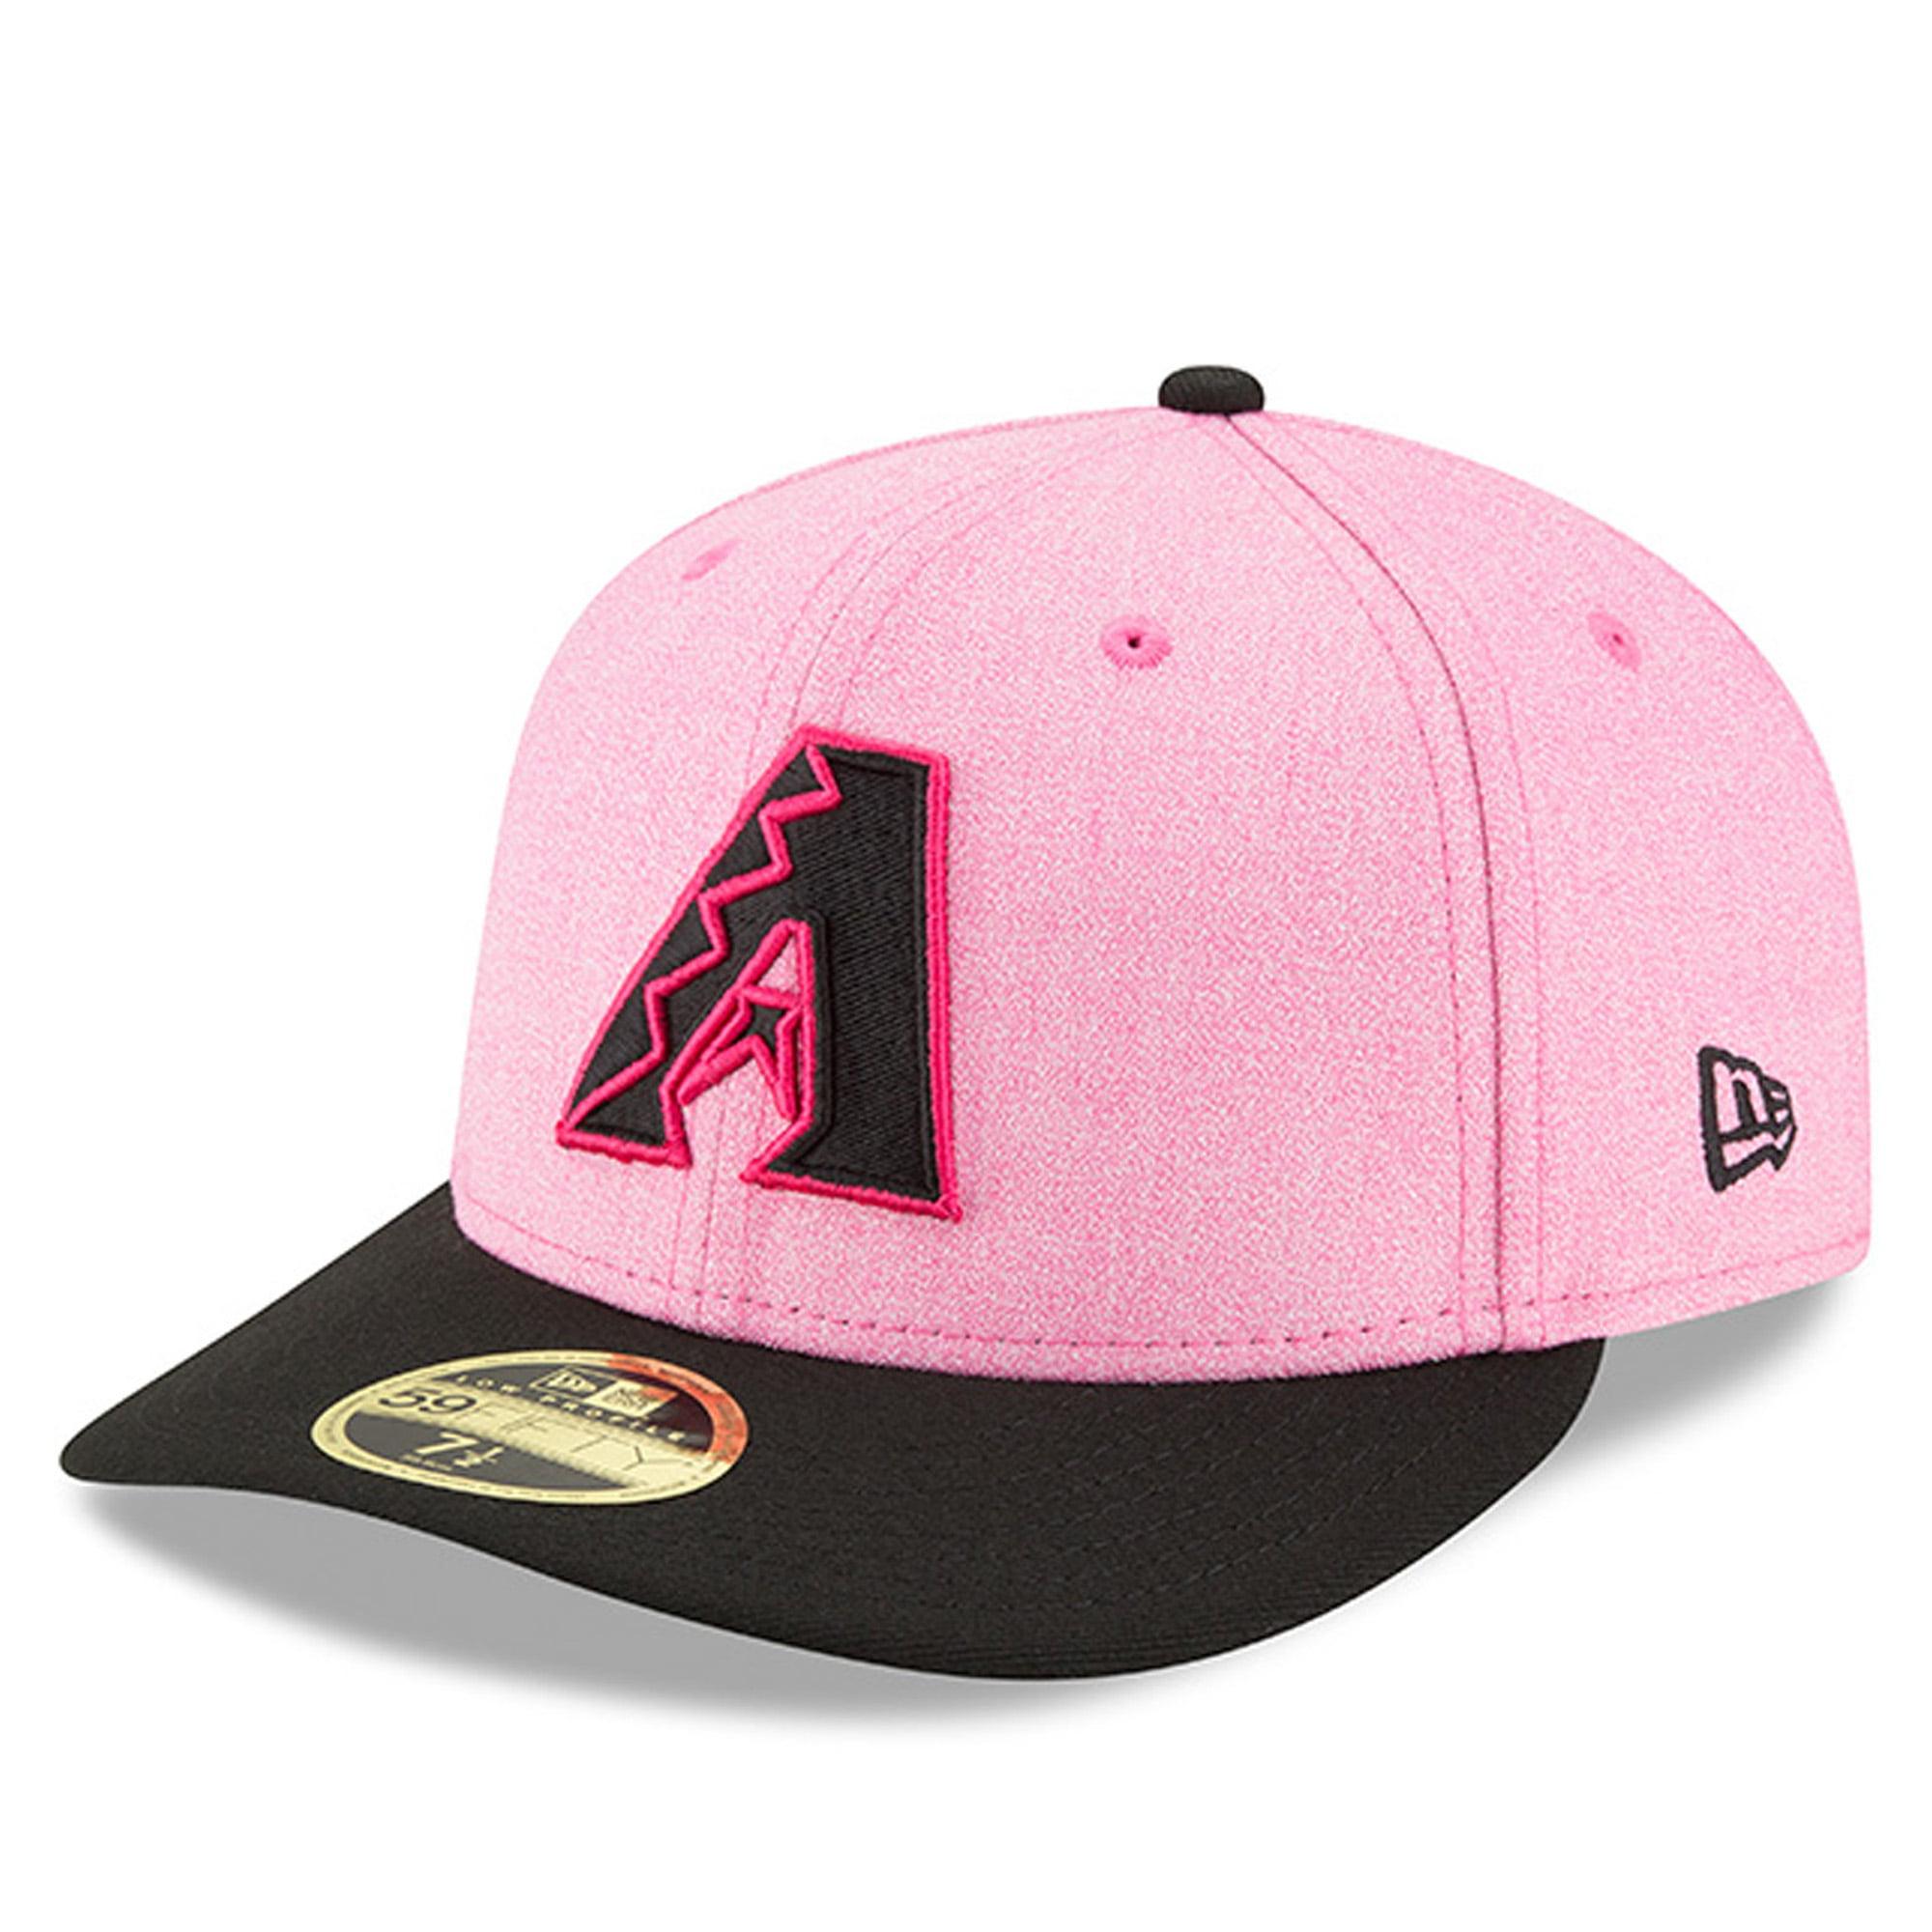 Arizona Diamondbacks New Era 2018 Mother's Day On-Field Low Profile 59FIFTY Fitted Hat - Pink/Black